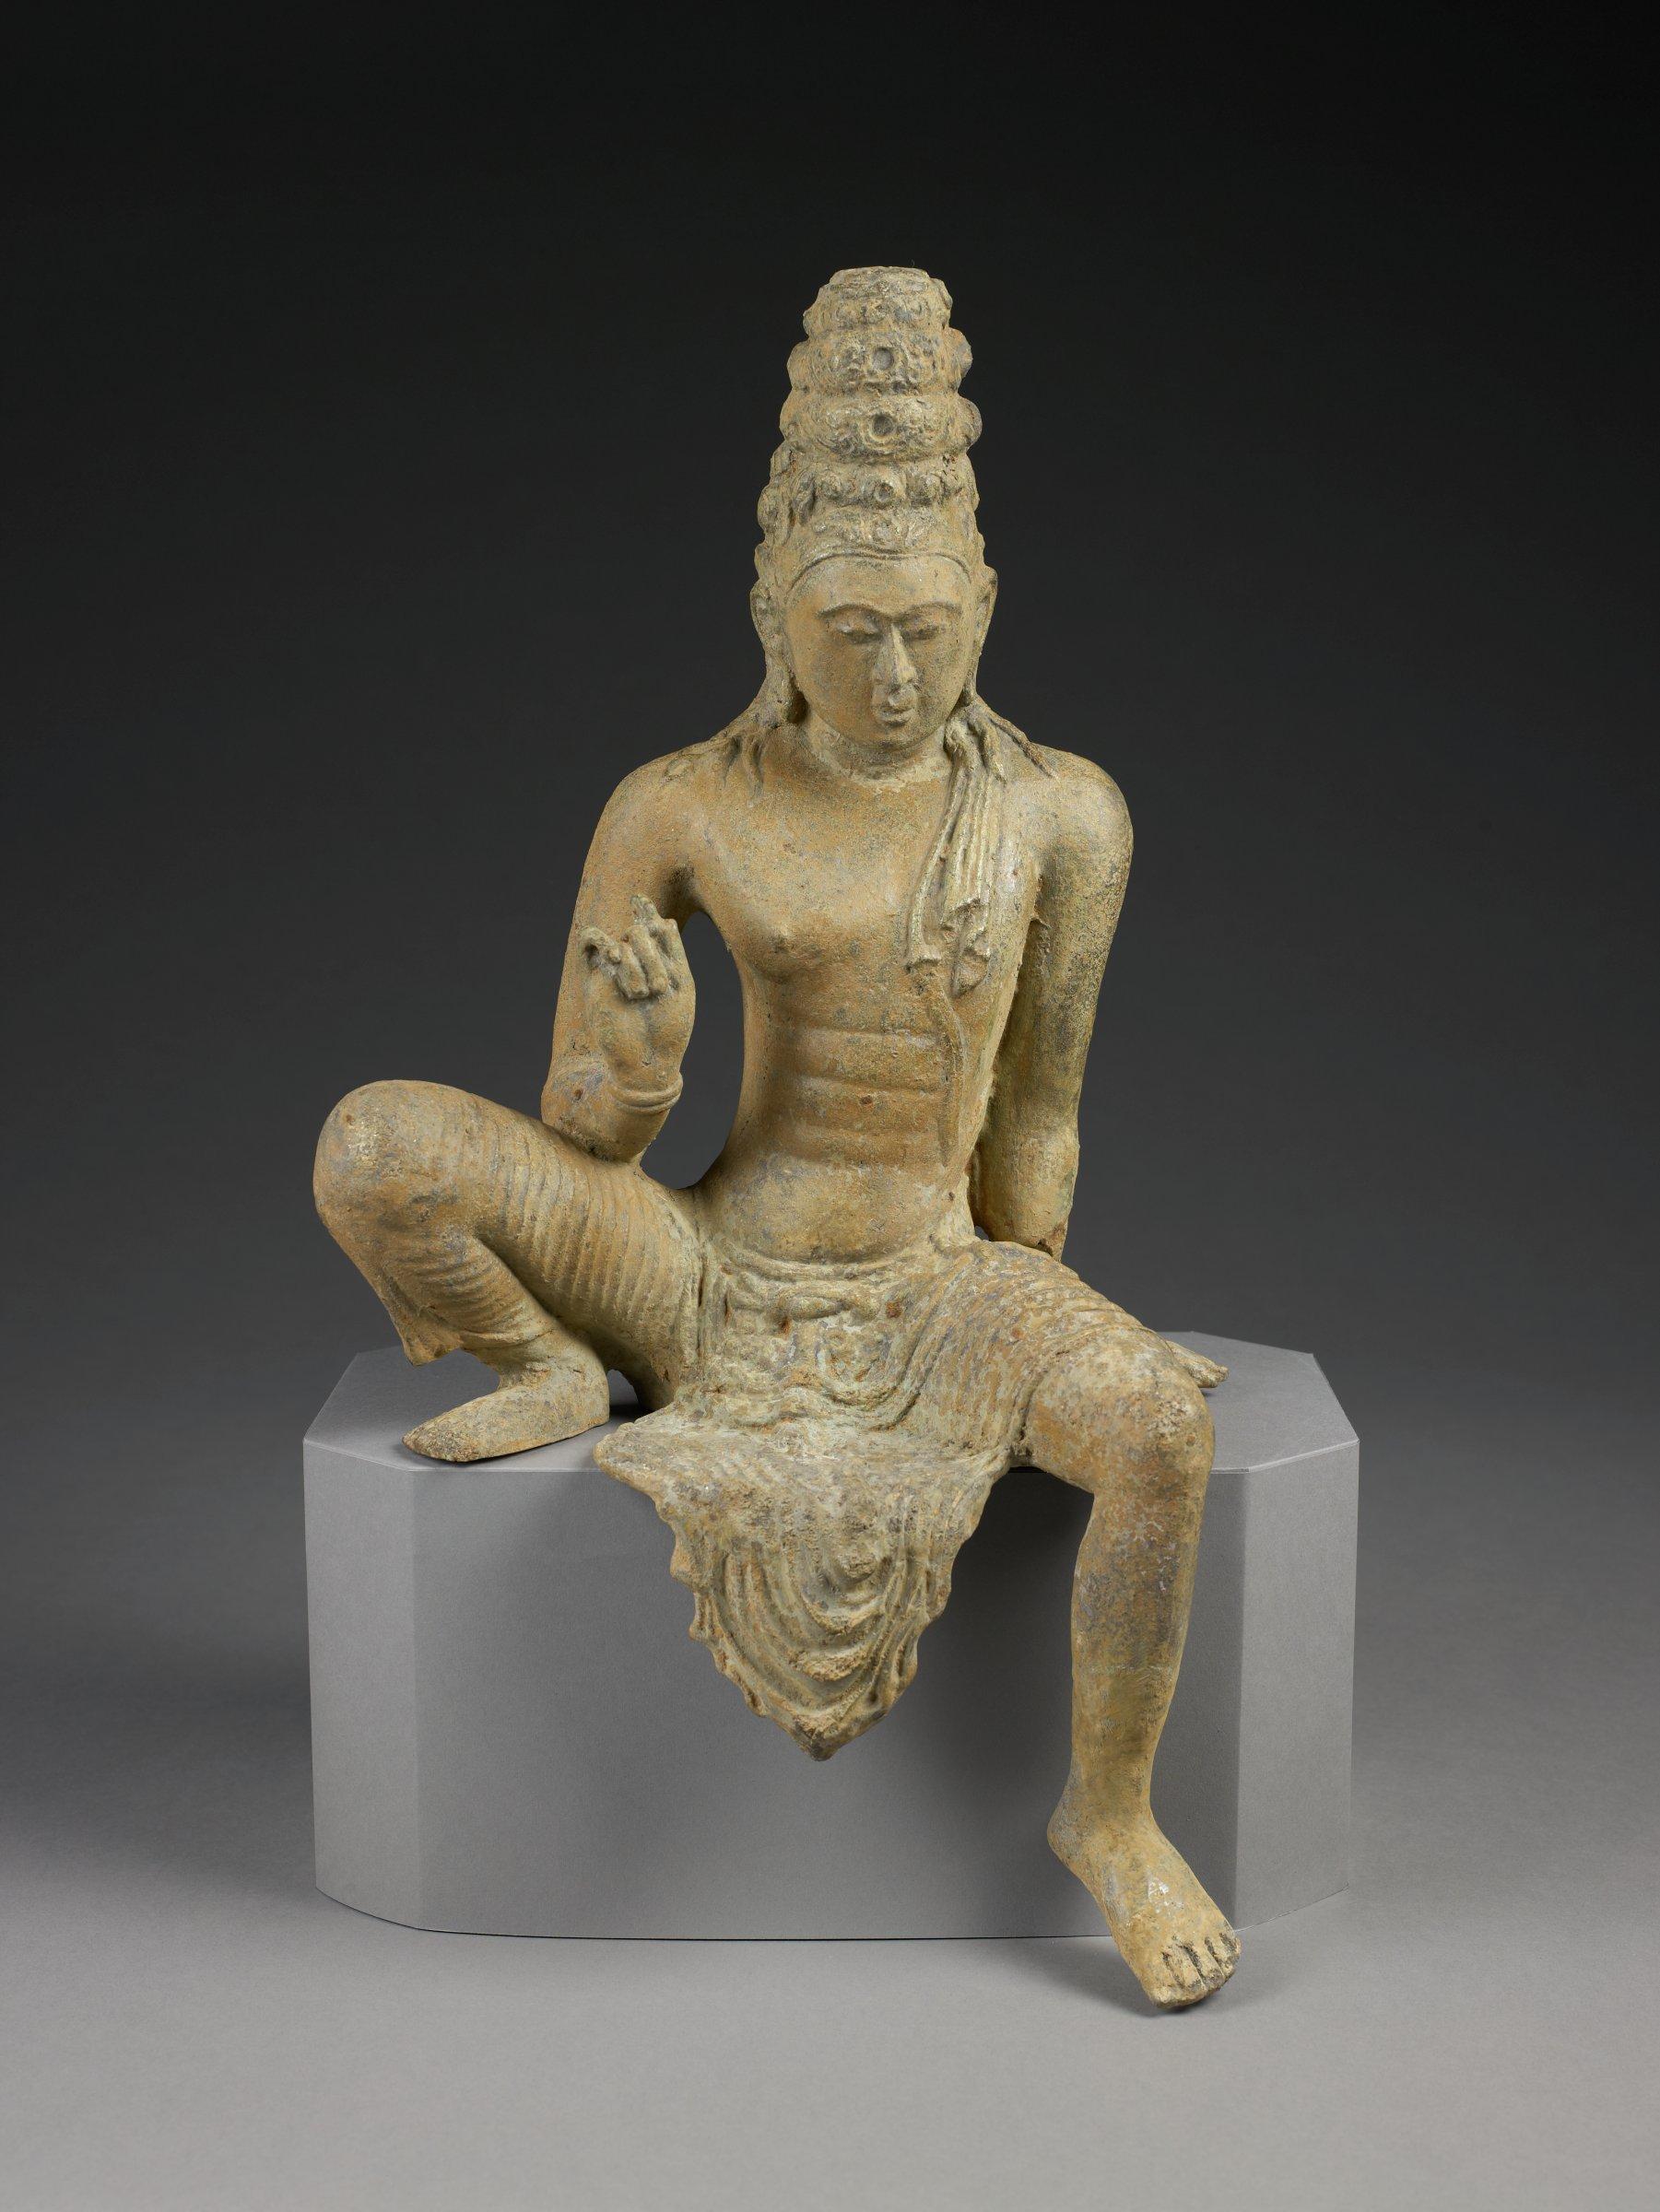 Large image of Avalokitesvara seated in pose of Royal Ease